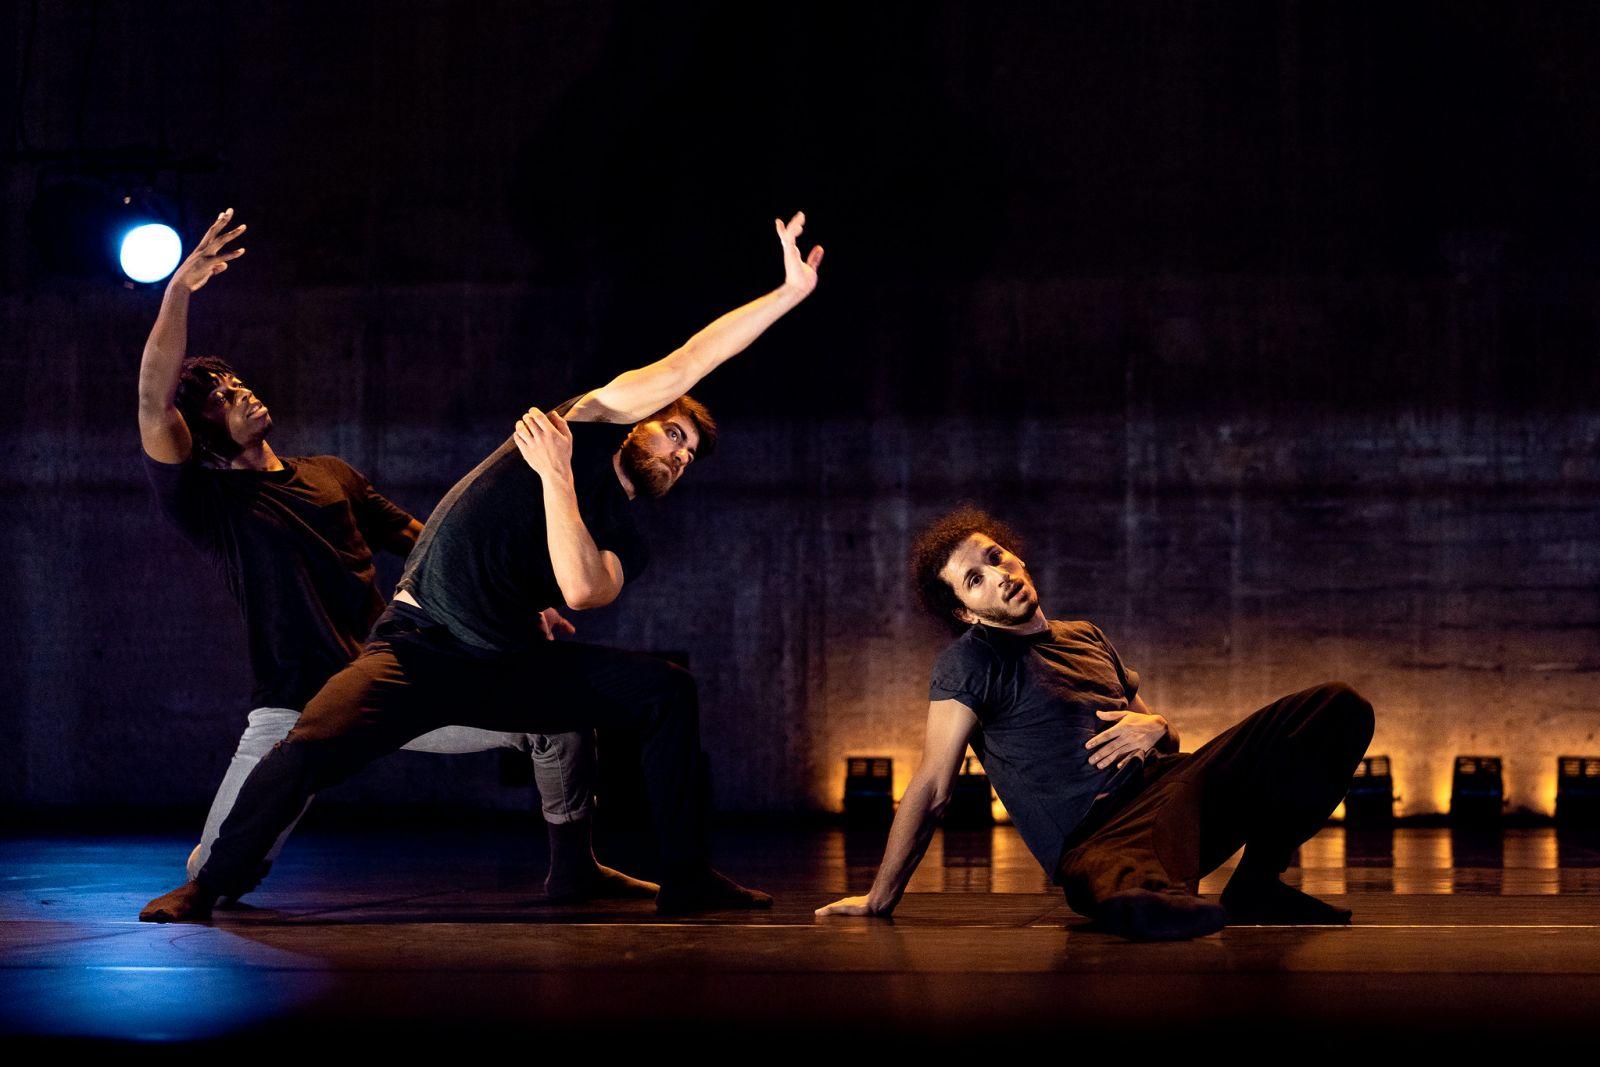 danse2021_hkc_urgence_credit_romain_tissot2.jpg